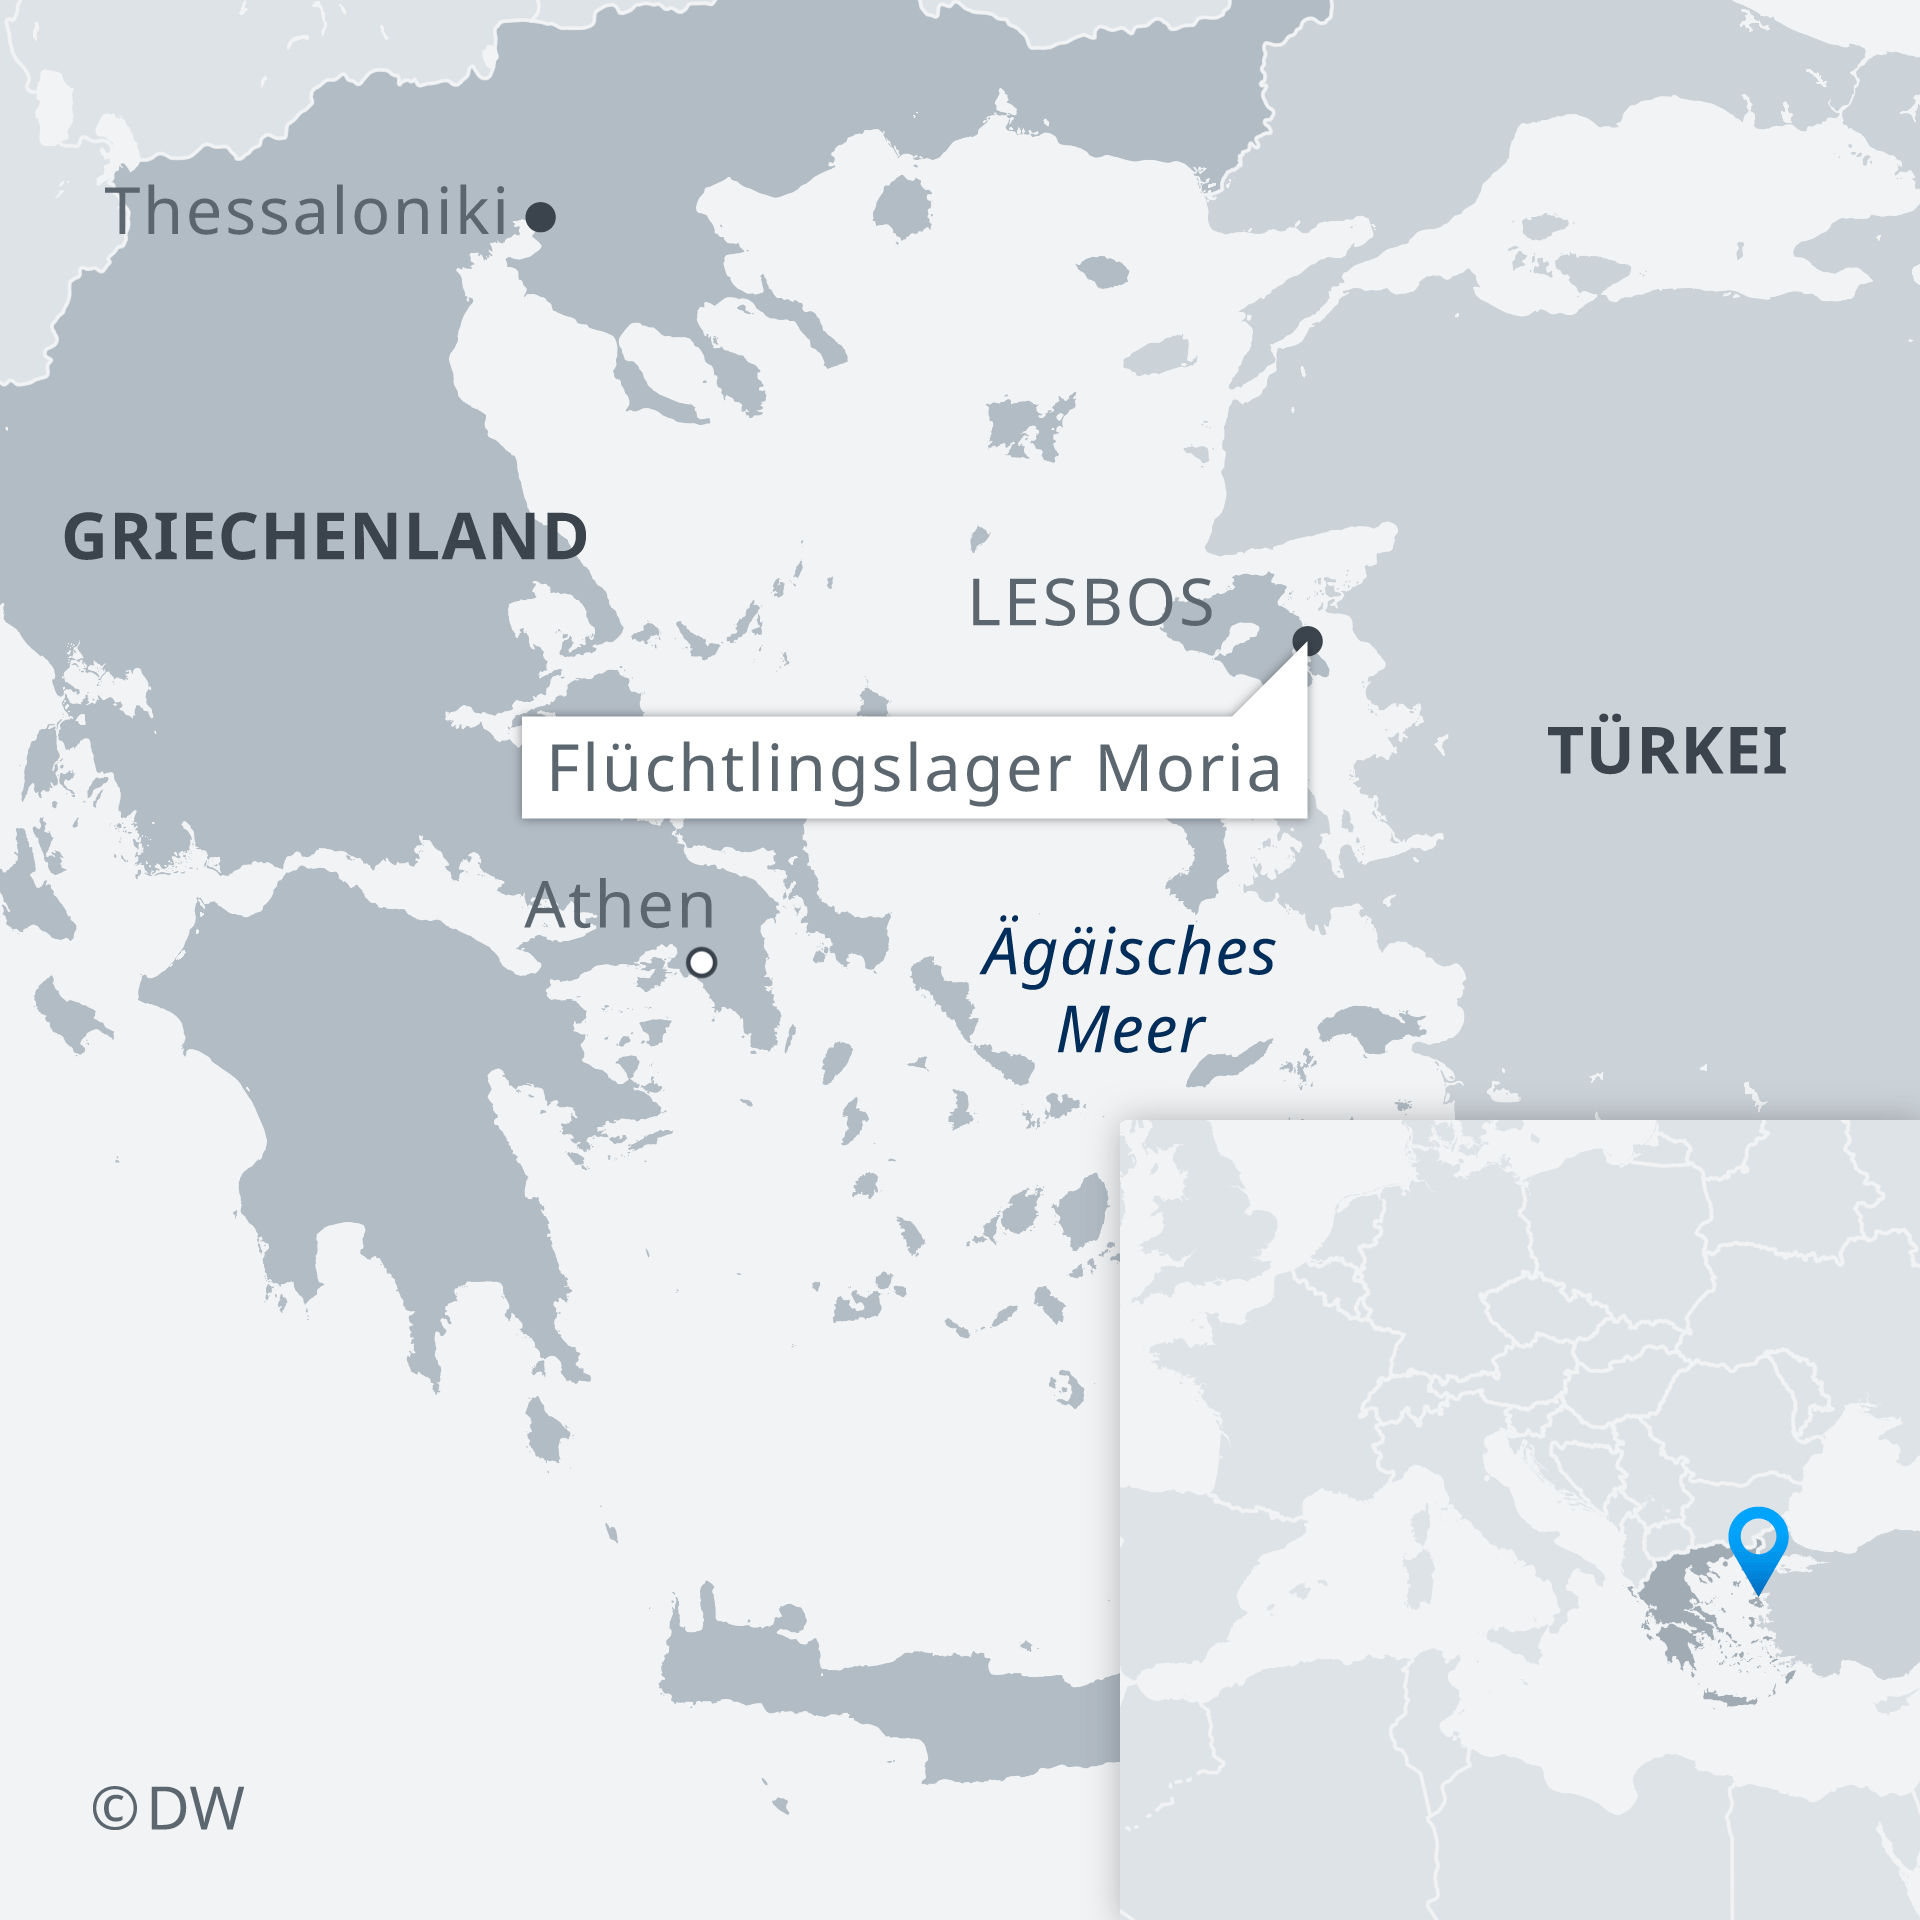 Karte Griechenland Flüchtlingslager Moria Lesbos DE